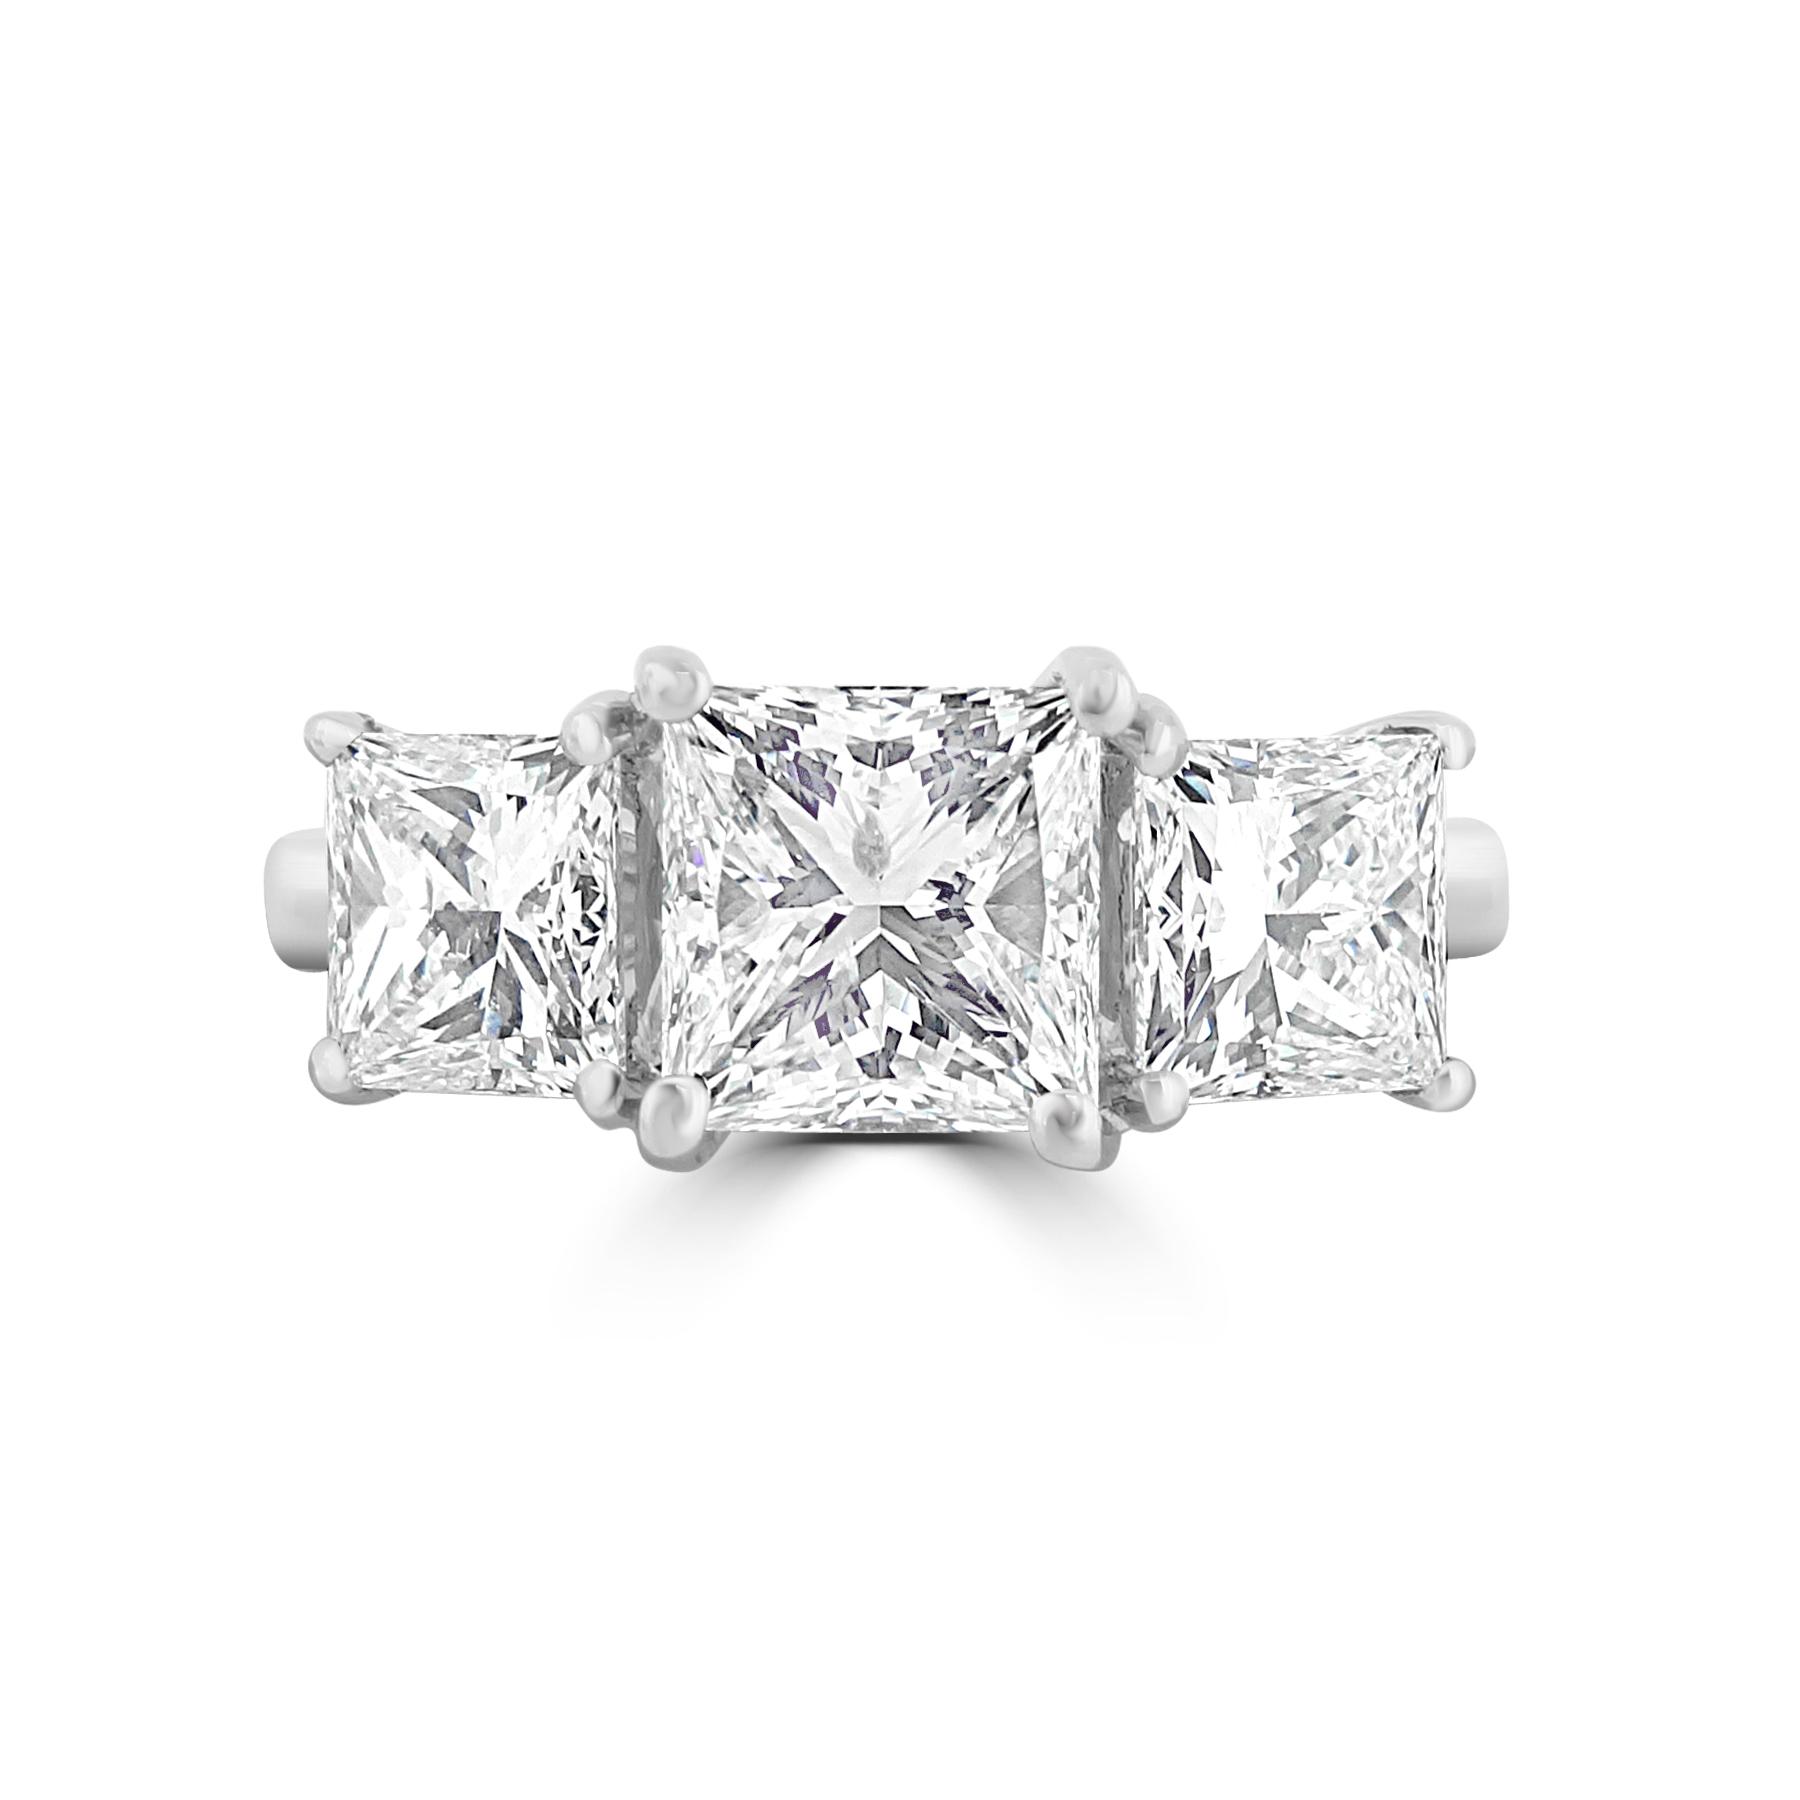 Platinum 3 Stone Princess Cut Ring – 2.66ct